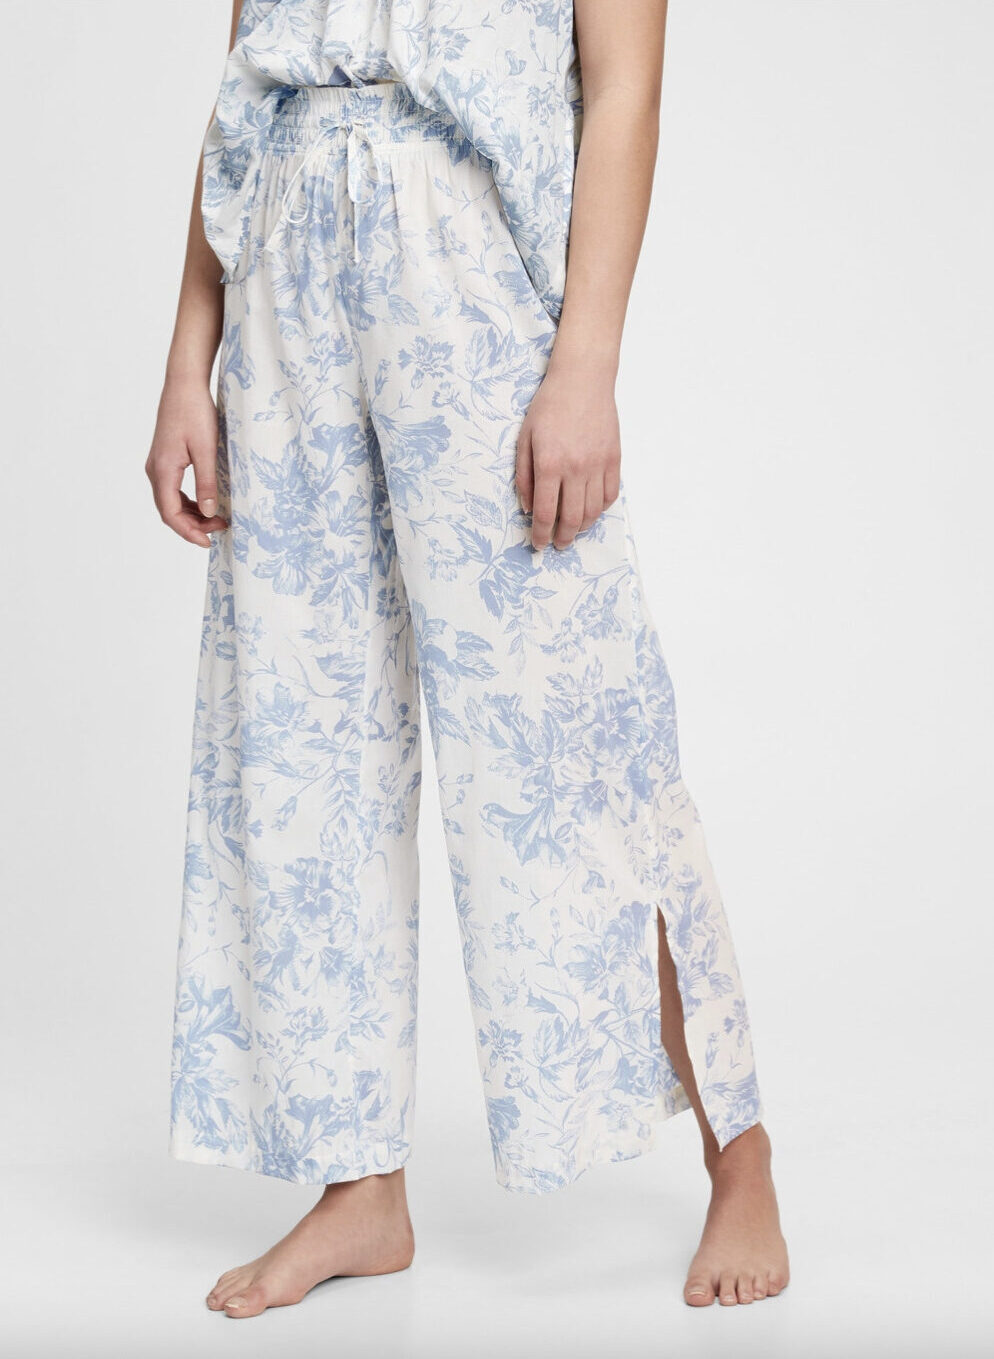 Gap Dreamwell Pajama Pants + Dreamwell Shirred Racerback Cami in Blue Floral